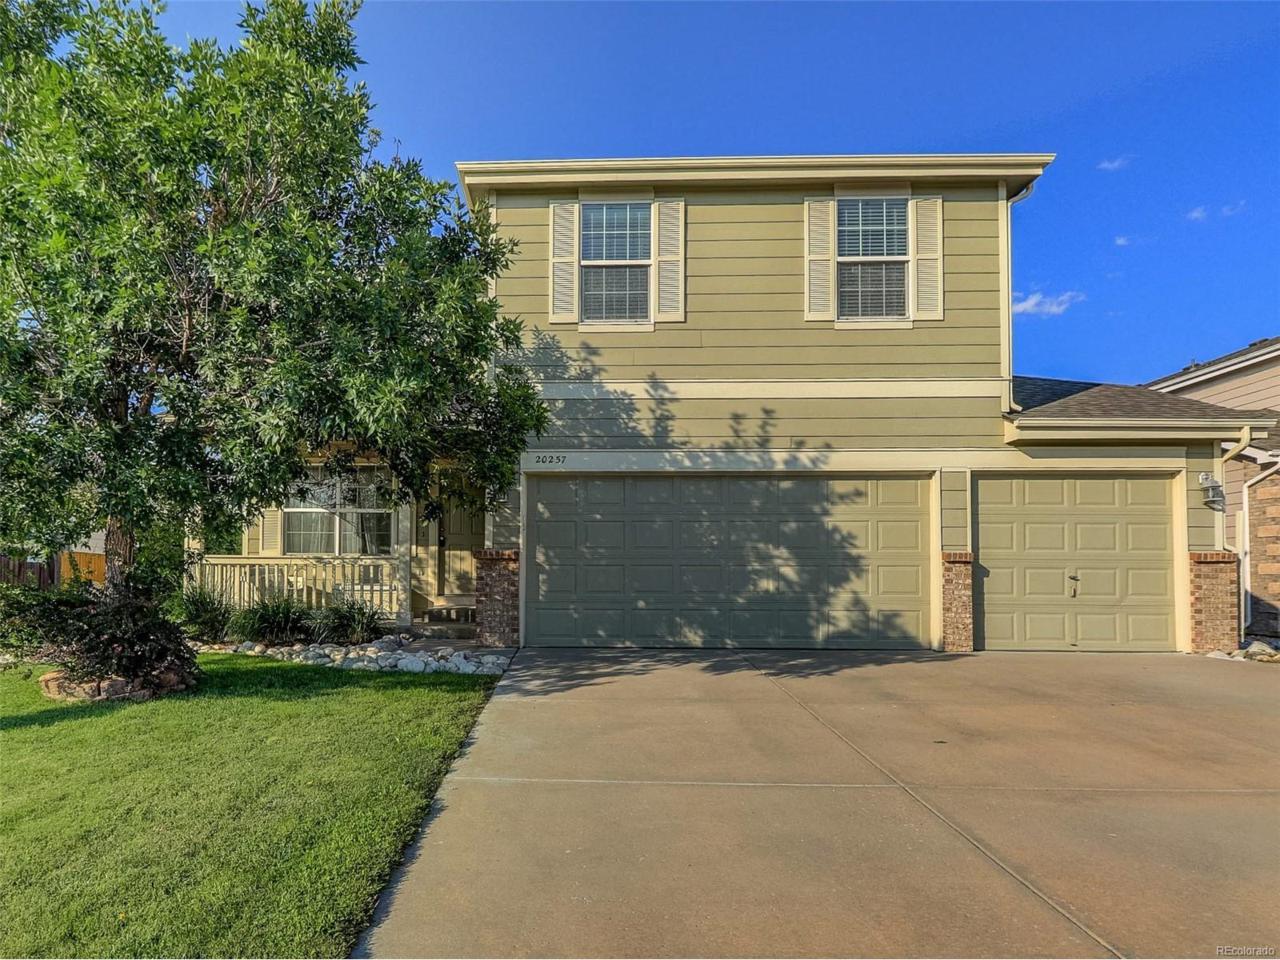 20257 E Tufts Drive, Aurora, CO 80015 (MLS #7638122) :: 8z Real Estate